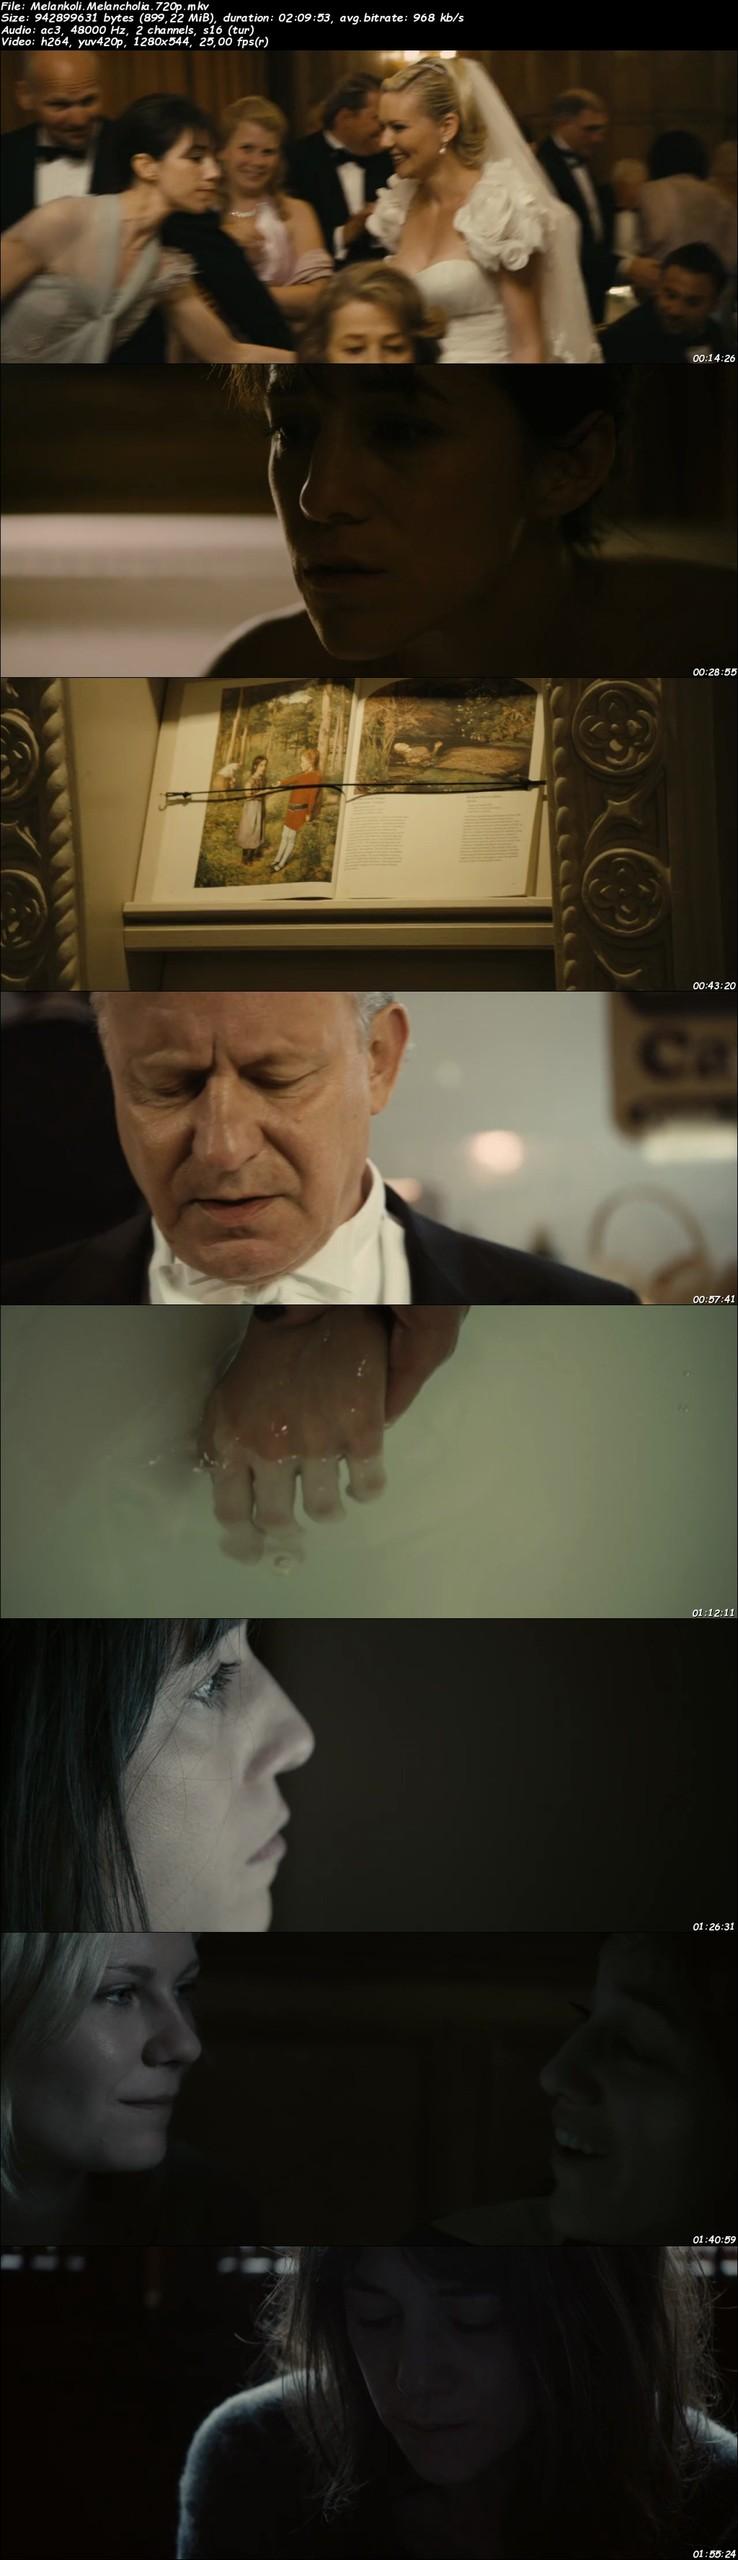 Melankoli (2011) m720p BluRay x264 Türkçe Dublaj İndir